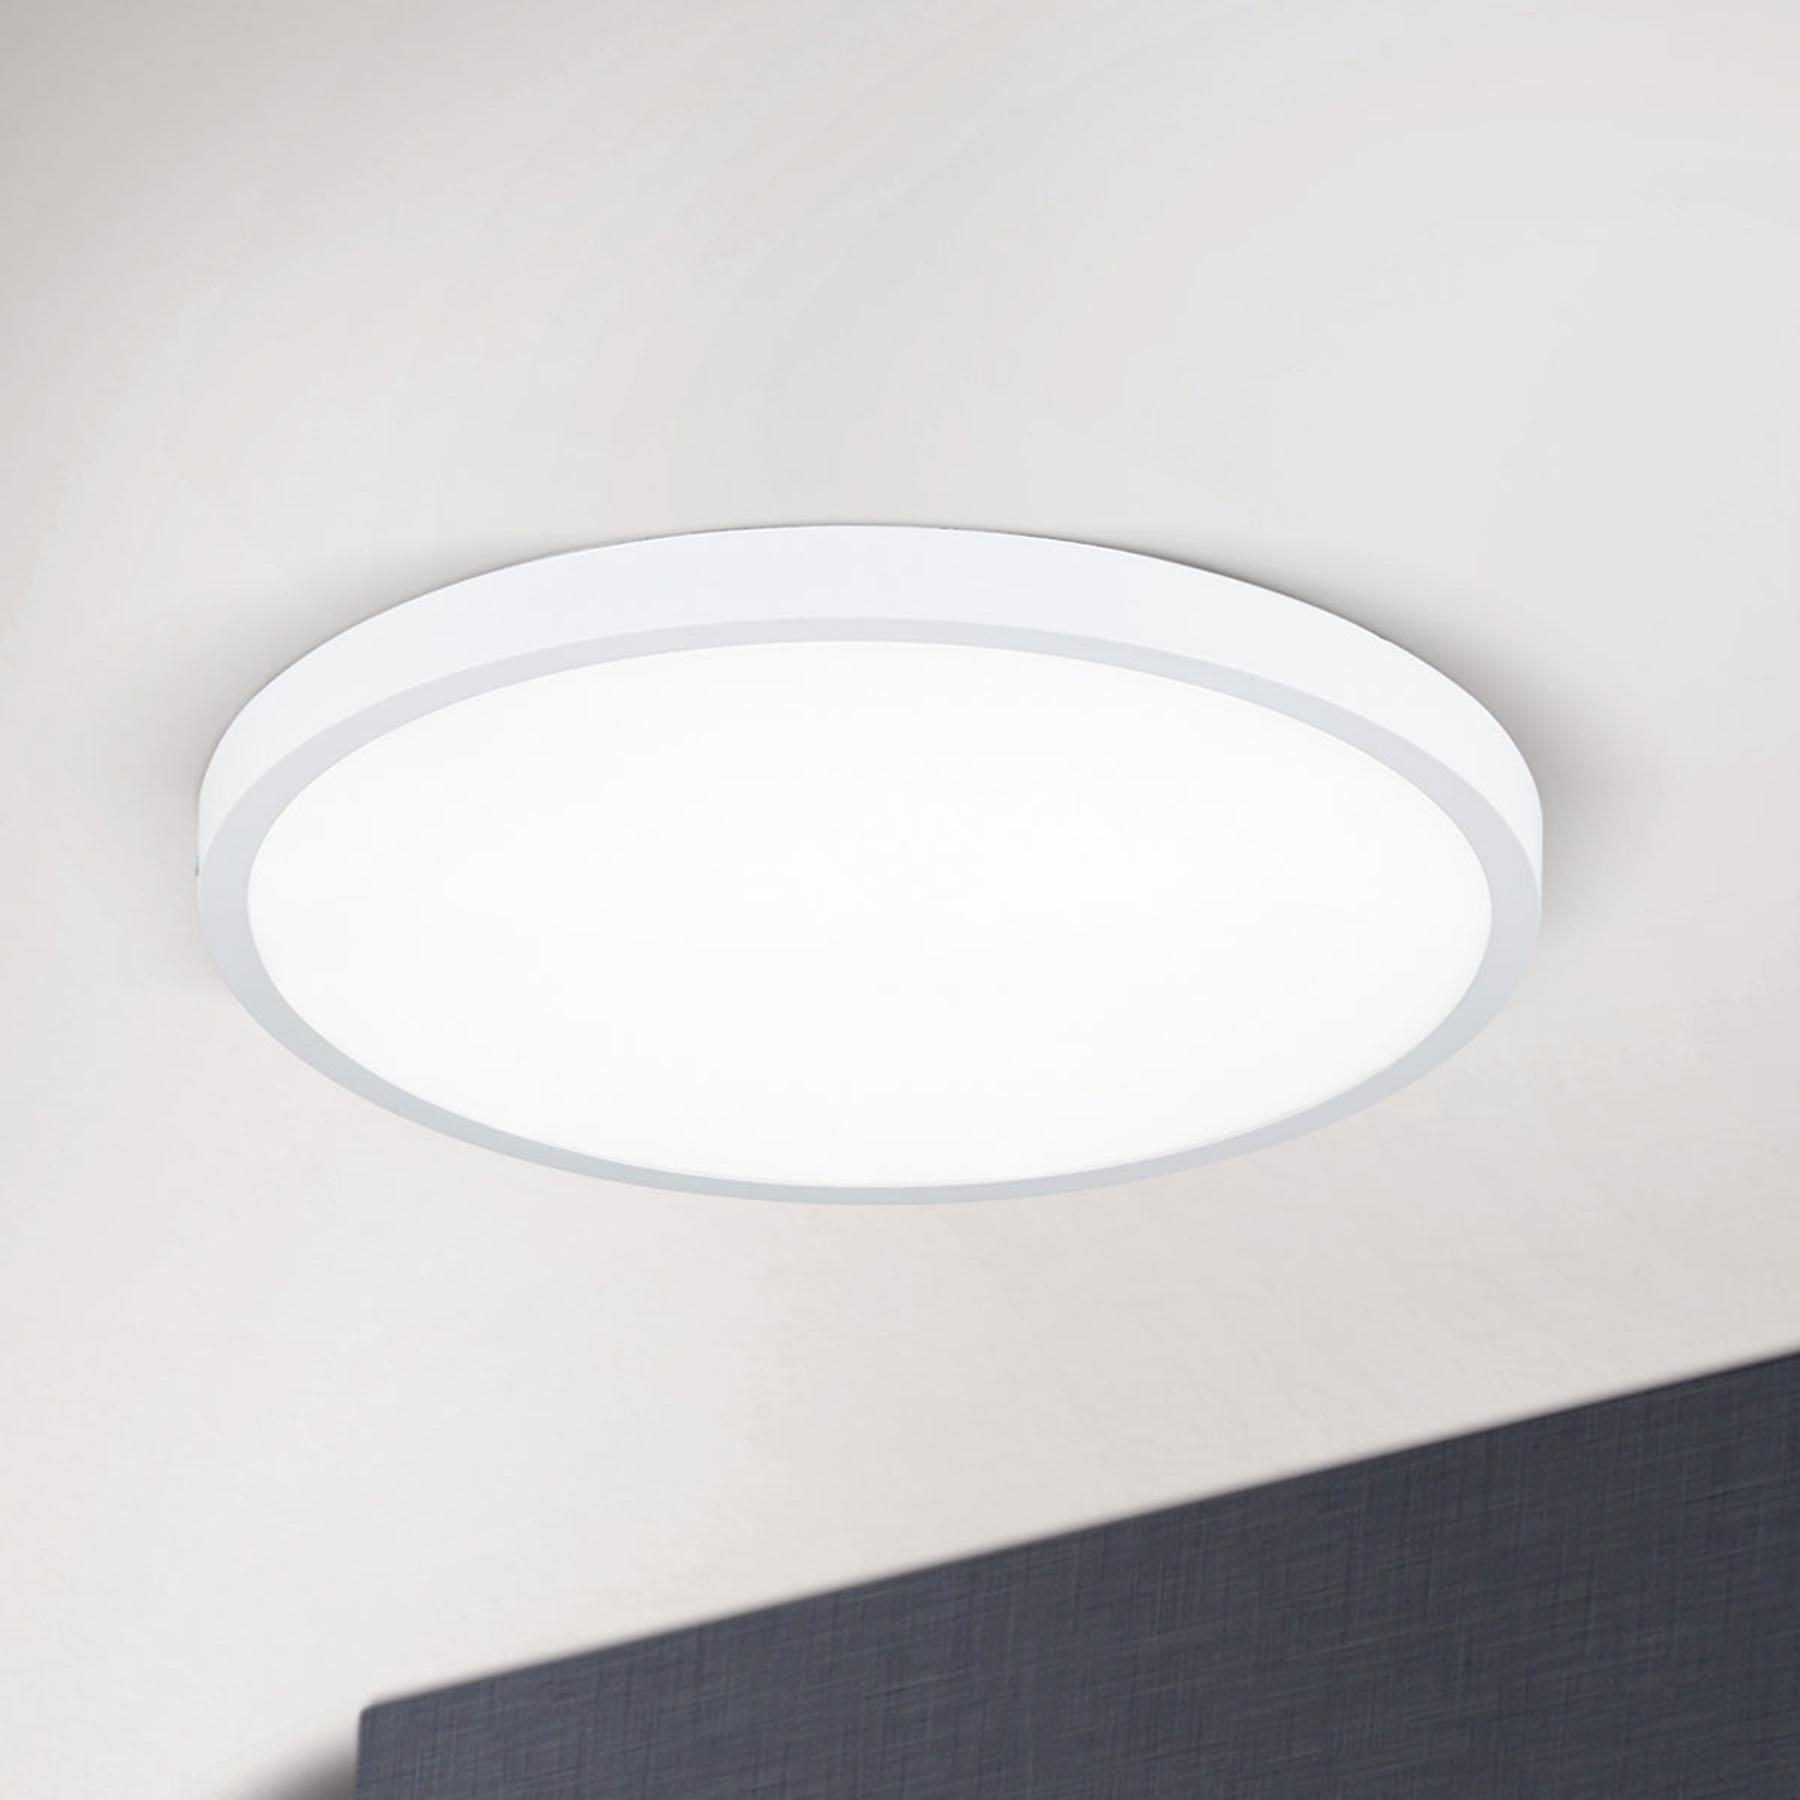 Ultra platte LED plafondlamp Lero 40 cm